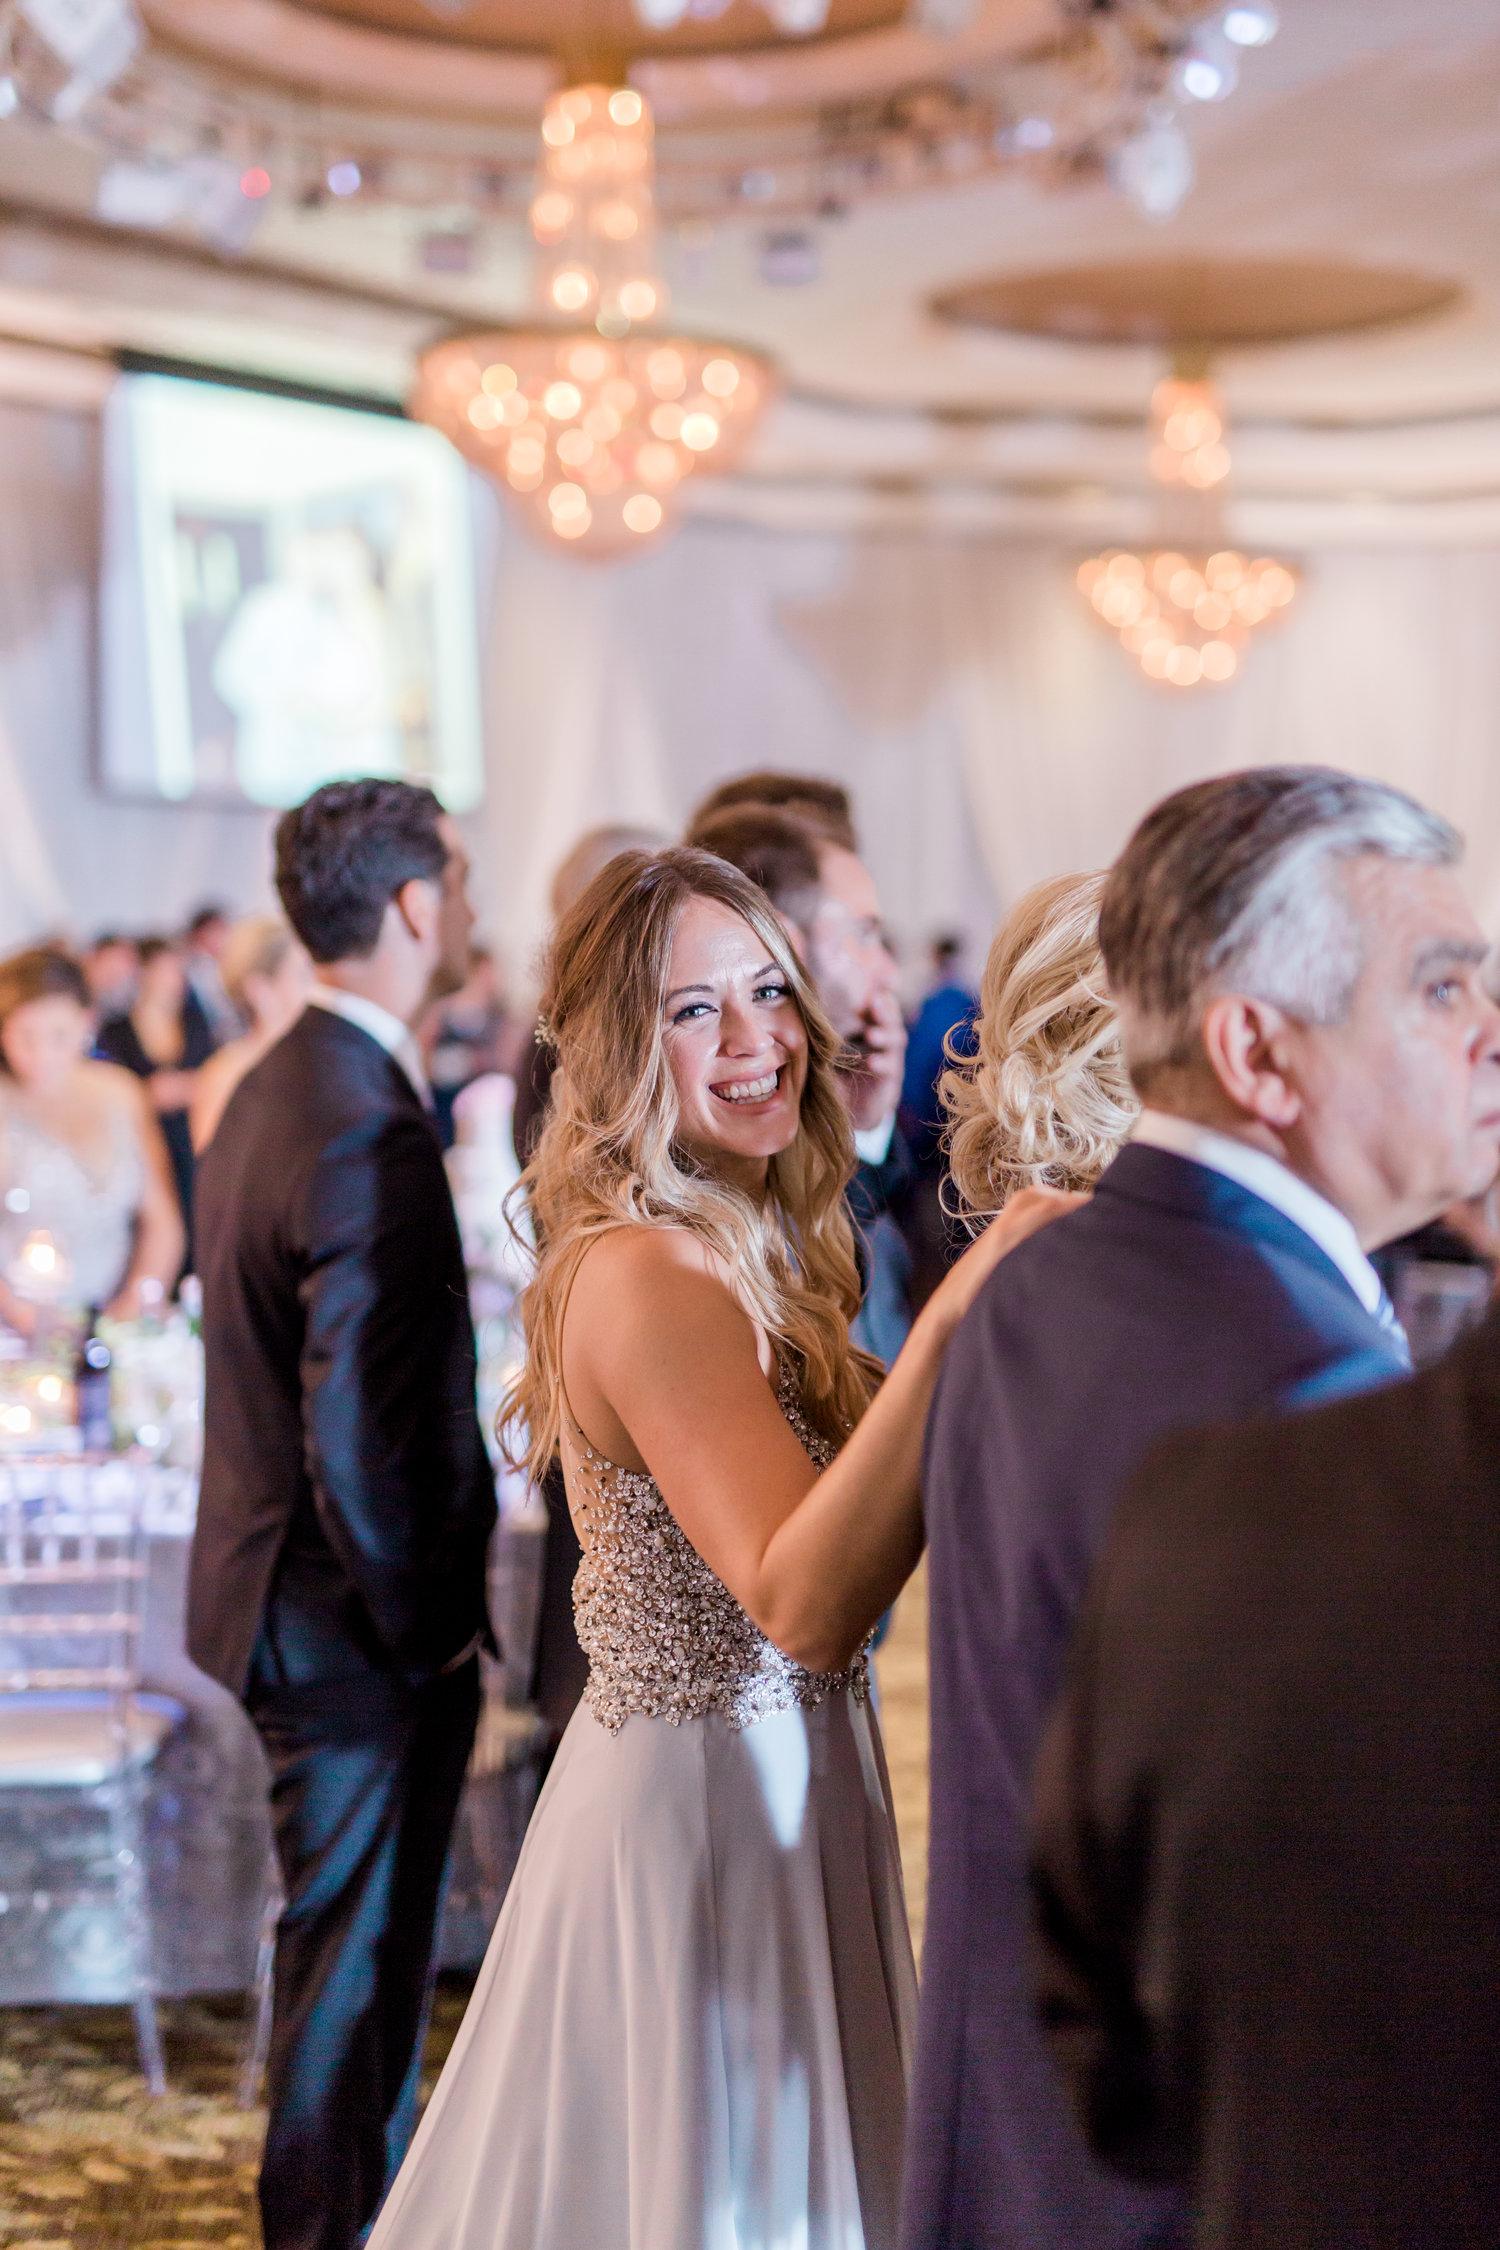 Danielle-Giroux-Amir-Golbazi-Toronto-Wedding-Photographer-Bellvue-Manor_DeLuca_2-373.jpg